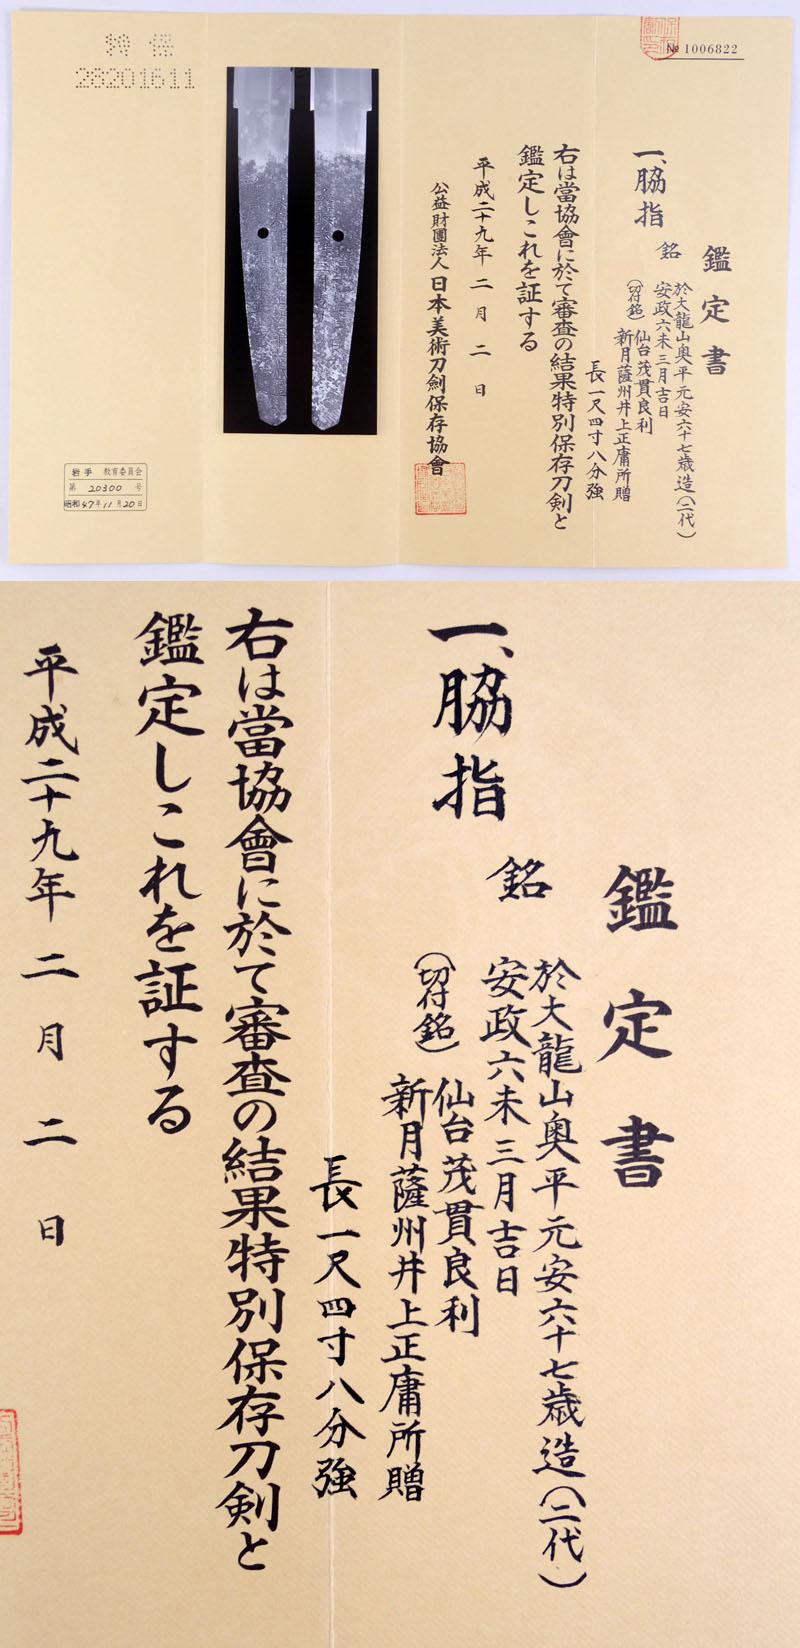 奥平元安六十七歳造(二代) Picture of Certificate